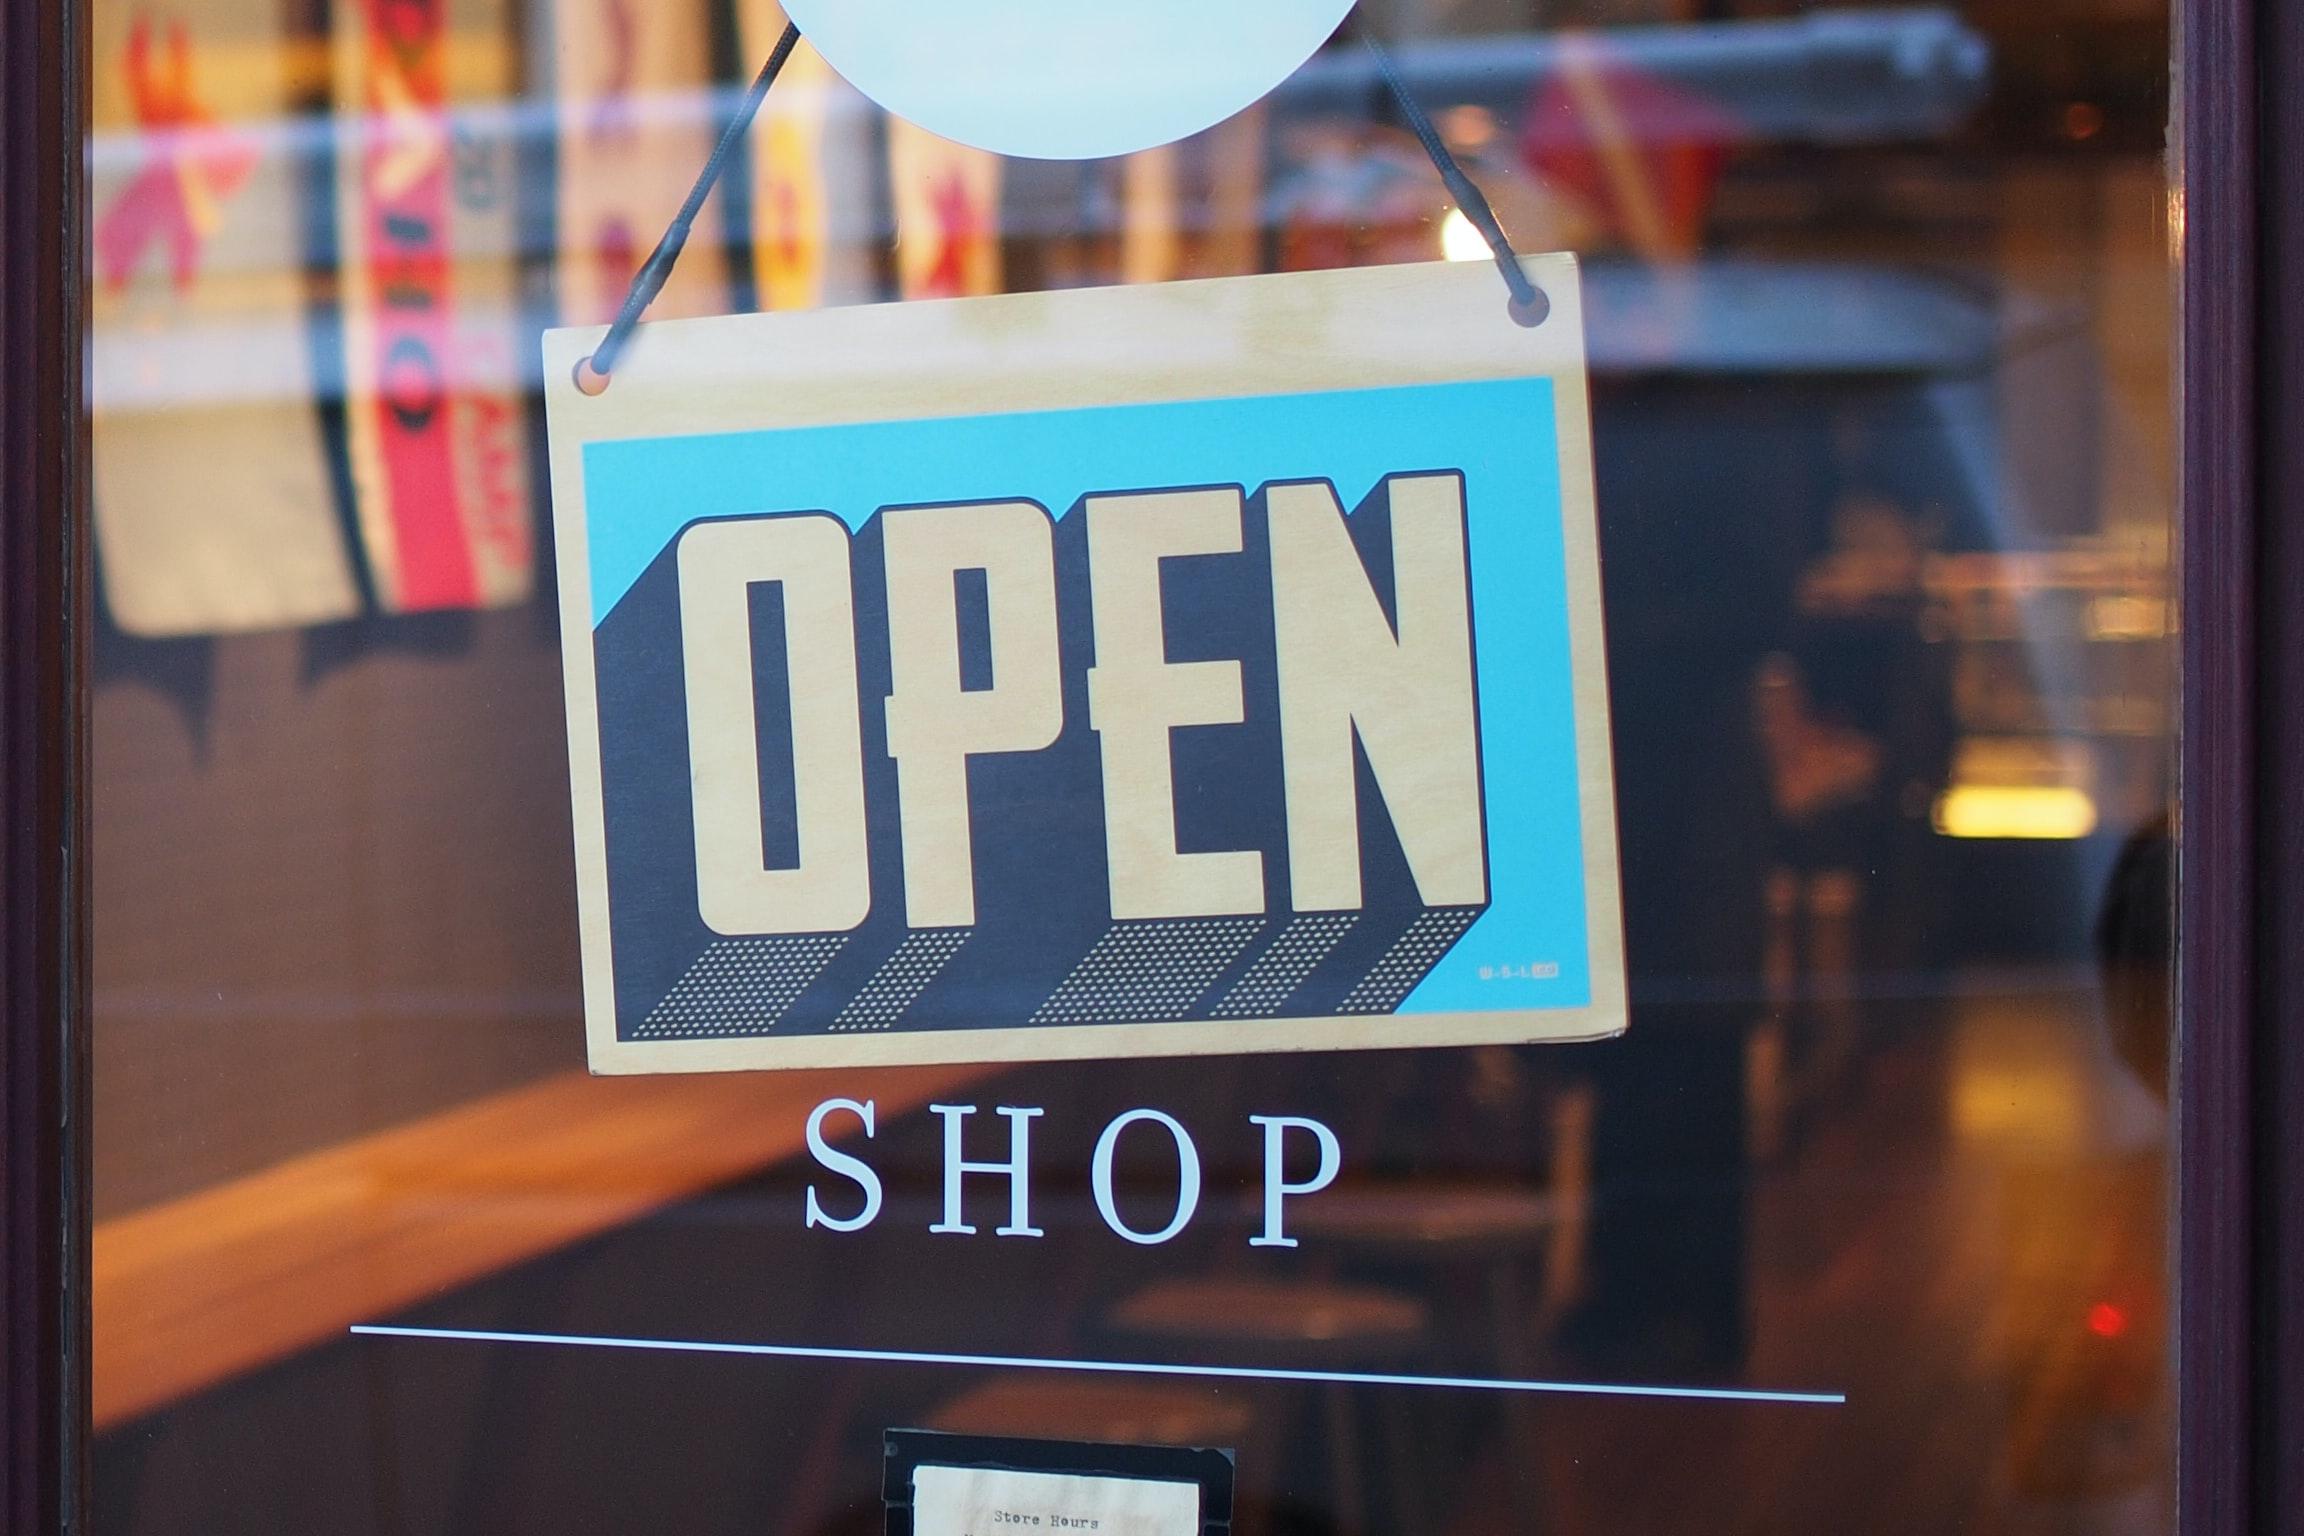 Shop store Open sign